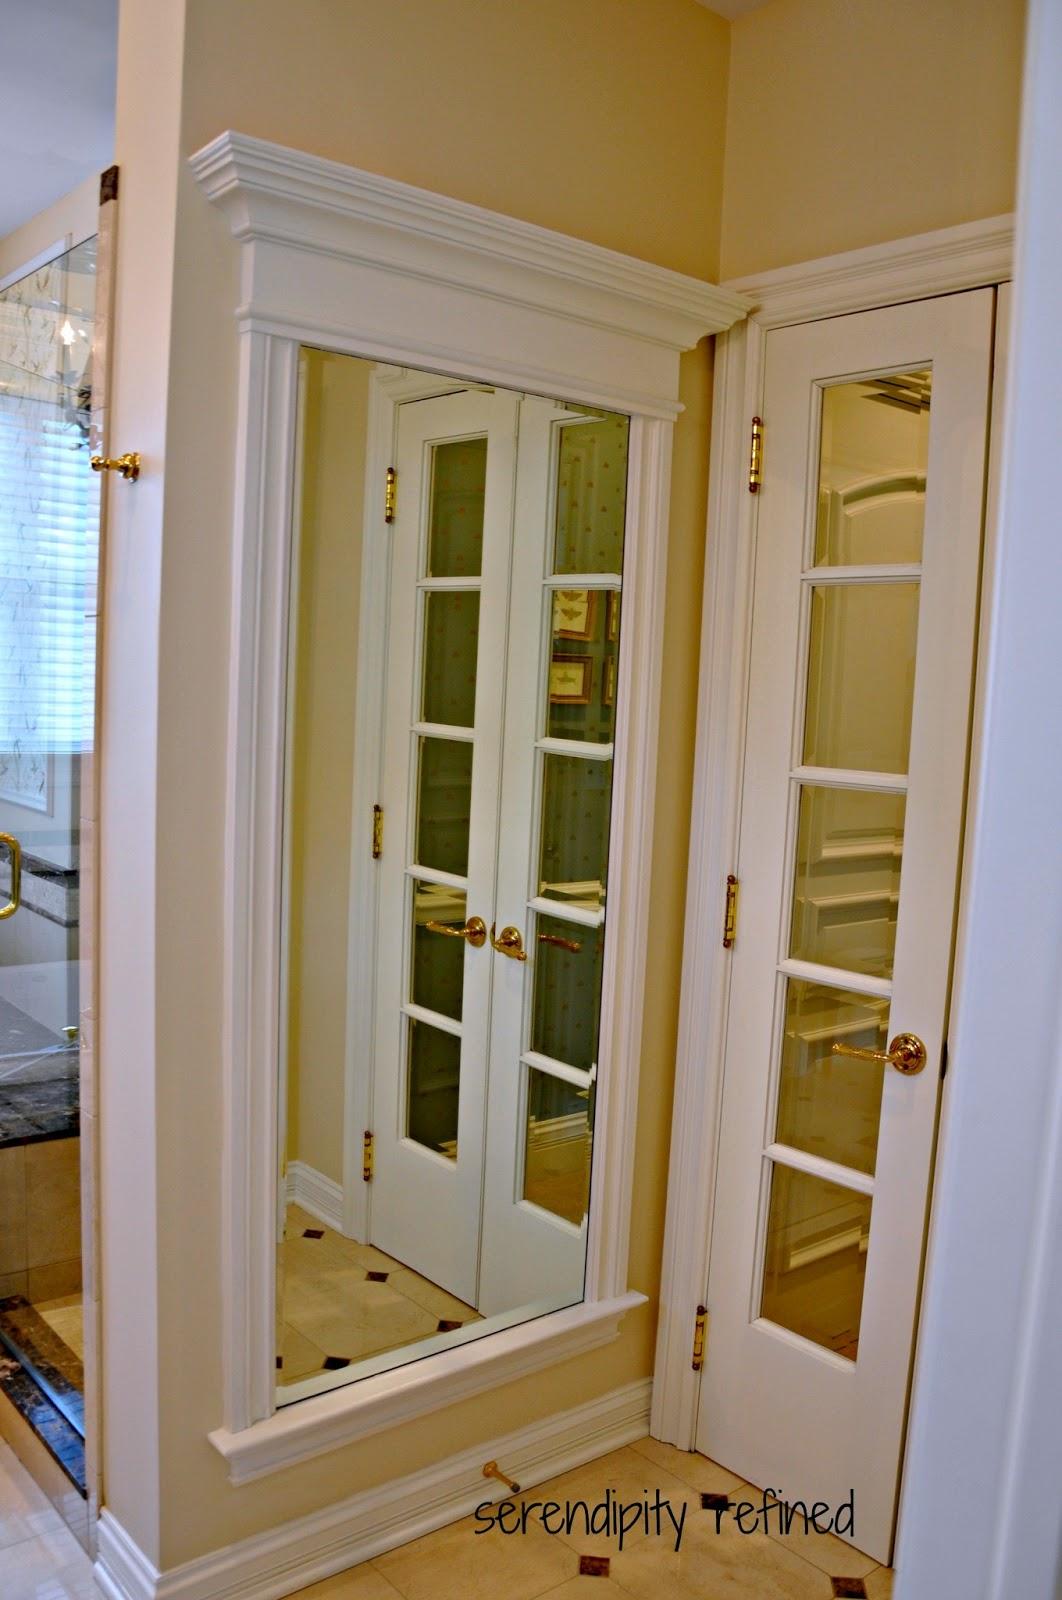 Serendipity refined blog master bathroom reveal - Full length bathroom wall mirror ...